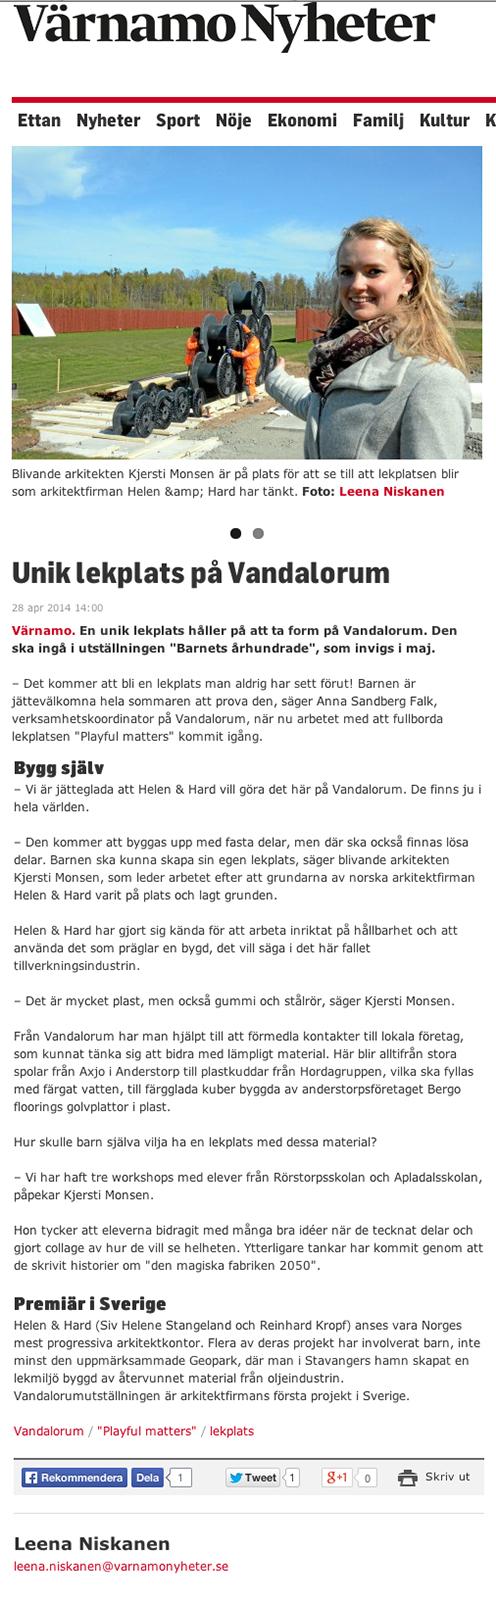 20140623 Unik lekplats på Vandalorum - Nyhet.jpg